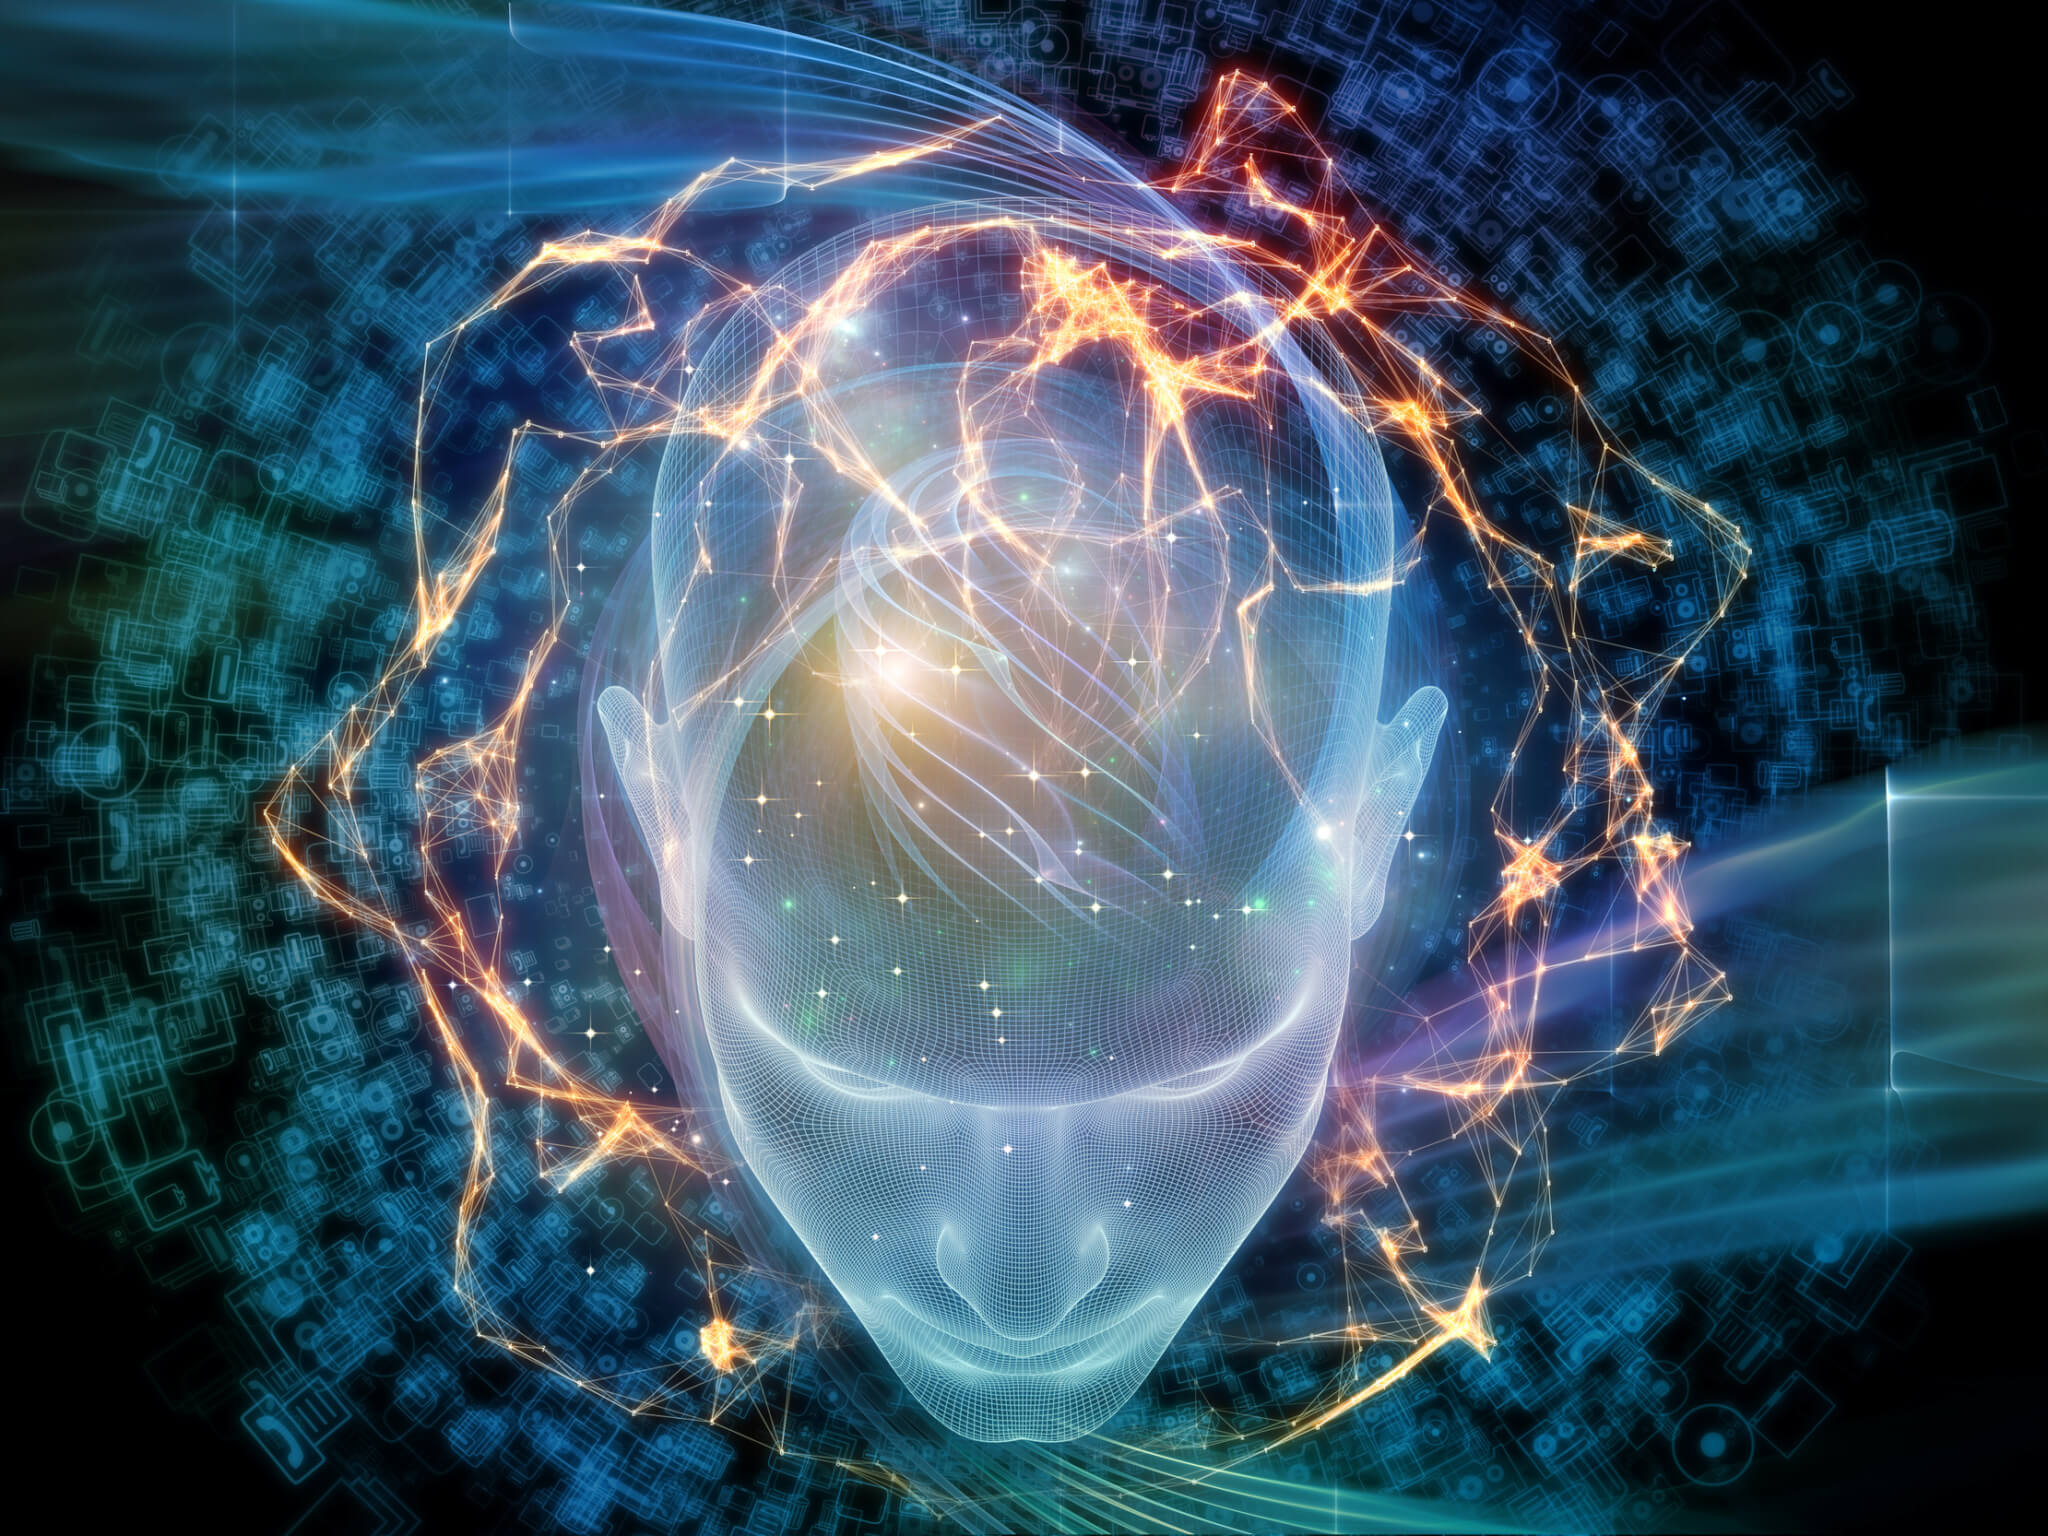 ia intelligence artificielle, Intelligence virtuelle, thème de la science, de la technologie